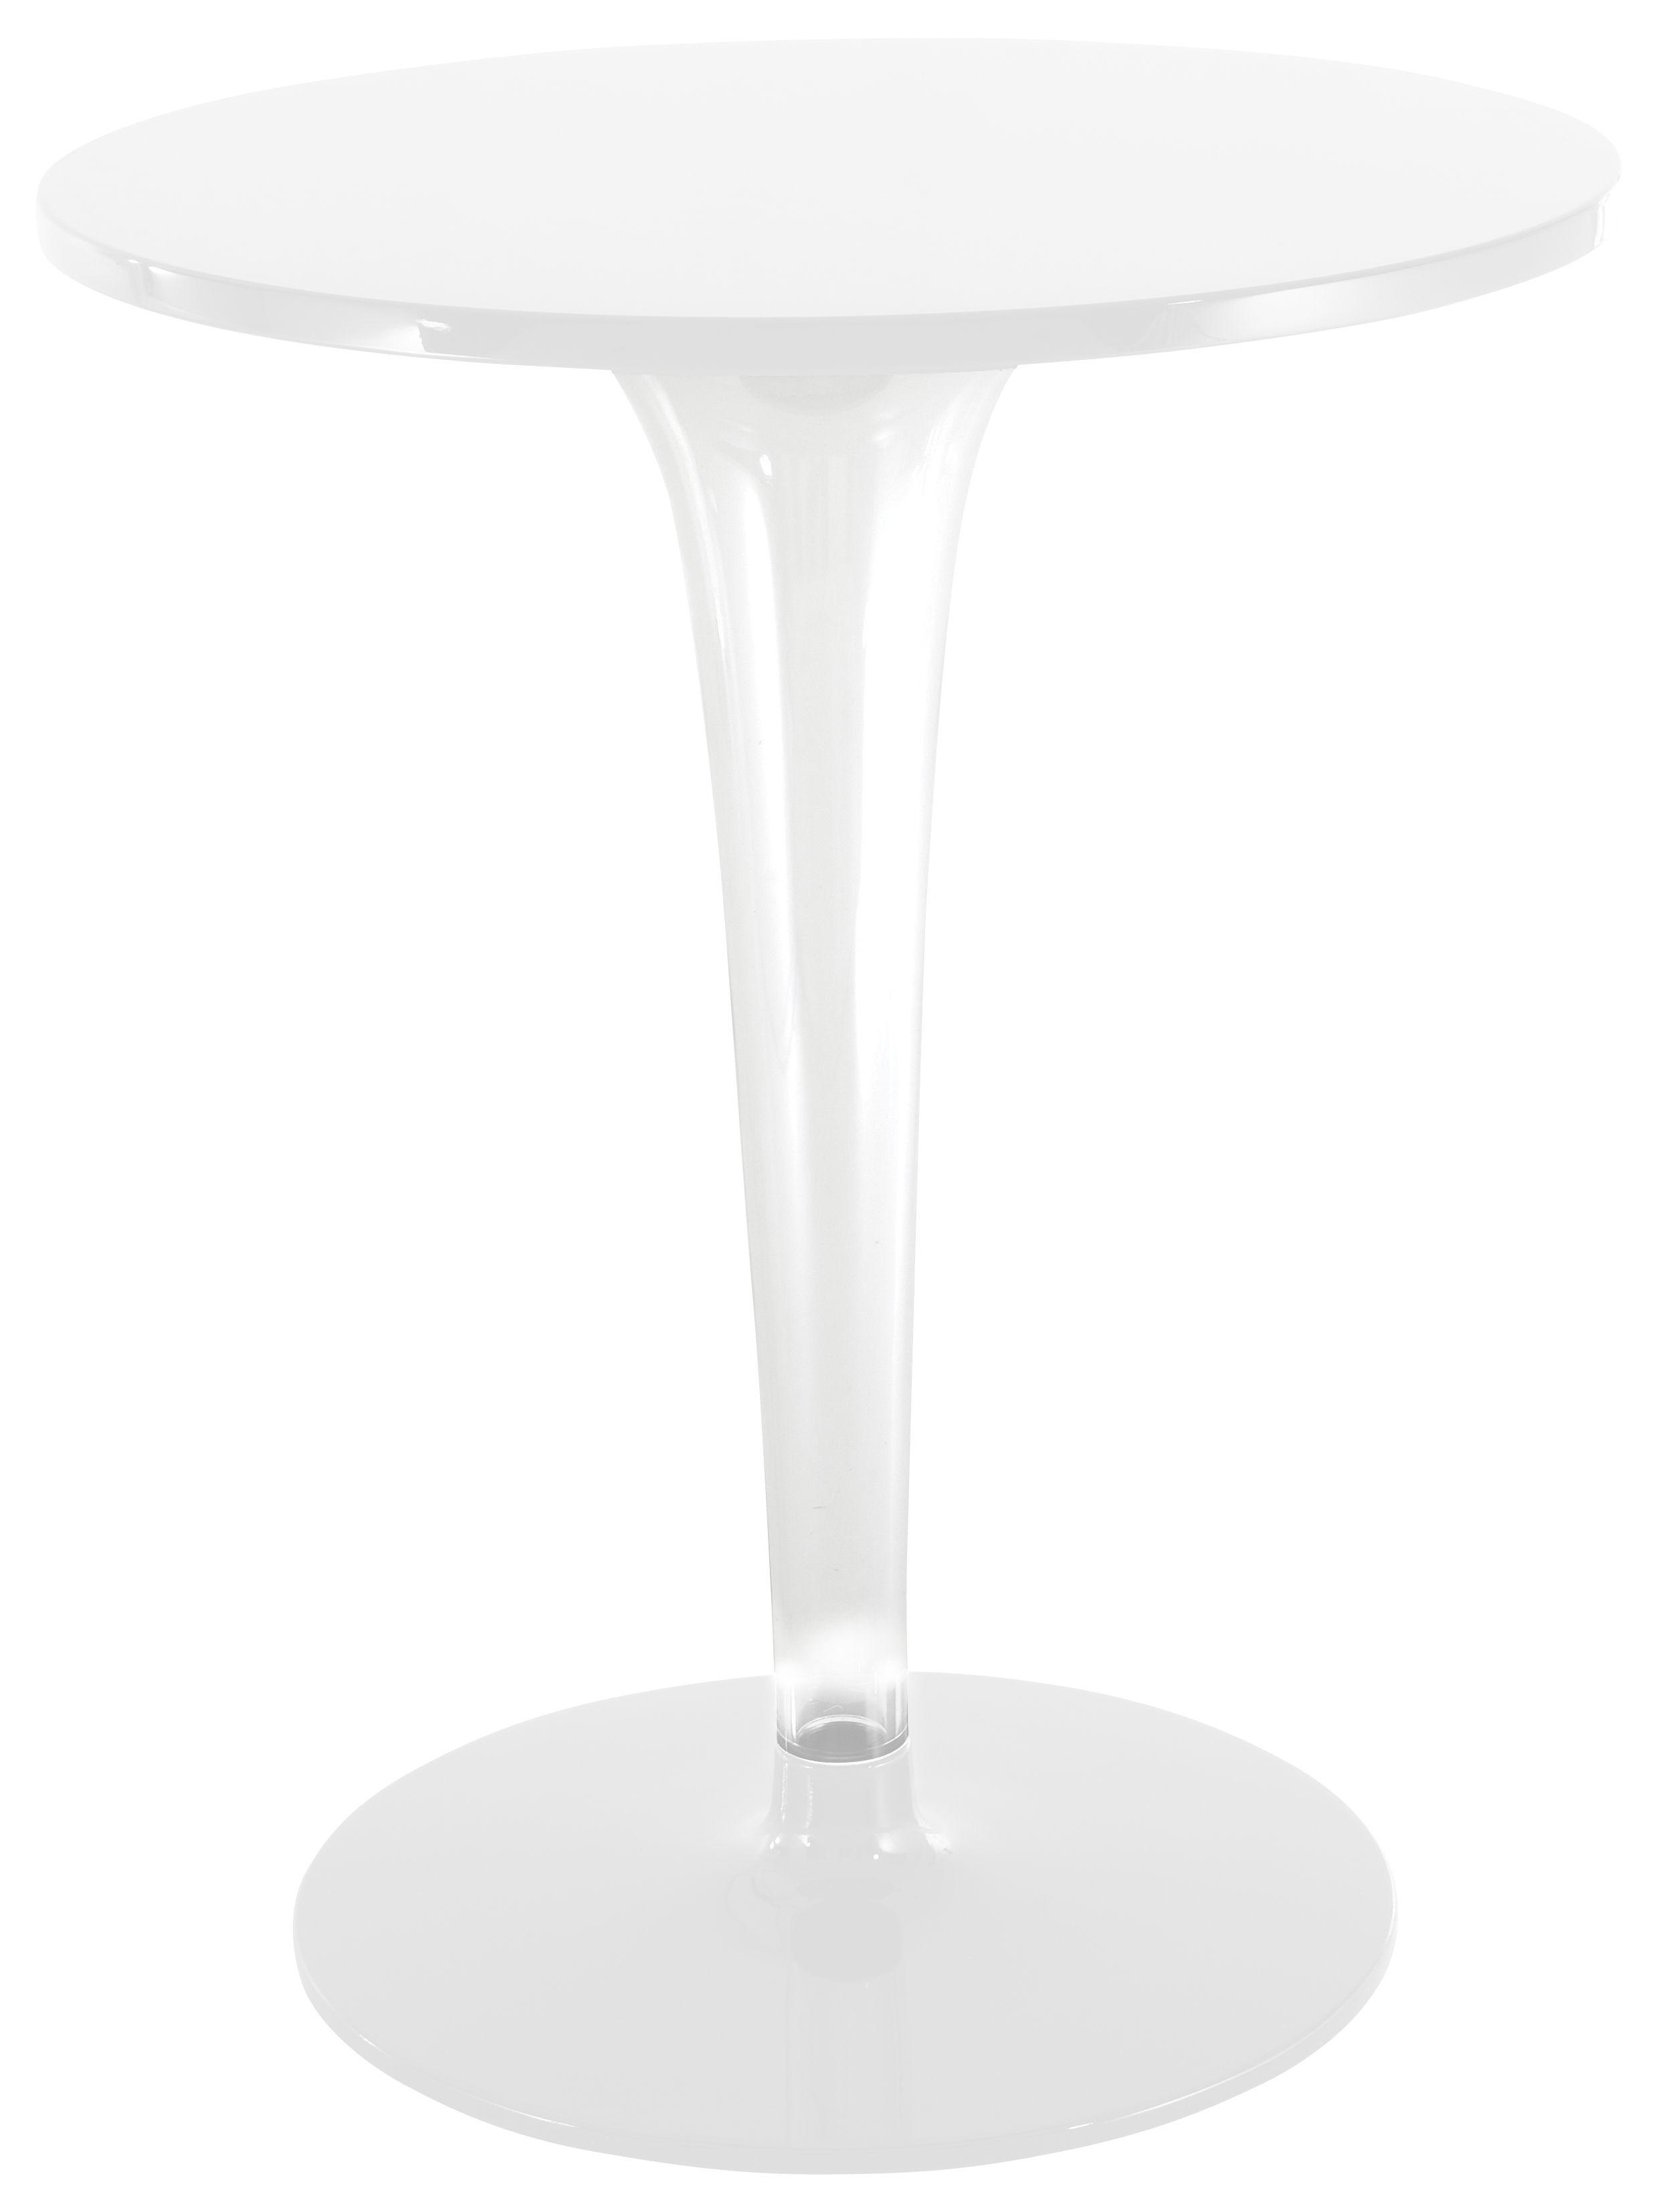 Jardin - Tables de jardin - Table ronde TopTop - Dr. YES / Ø 60 cm - Kartell - Ø 60 cm - Blanc / base et pied ronds - Aluminium verni, Mélamine, PMMA